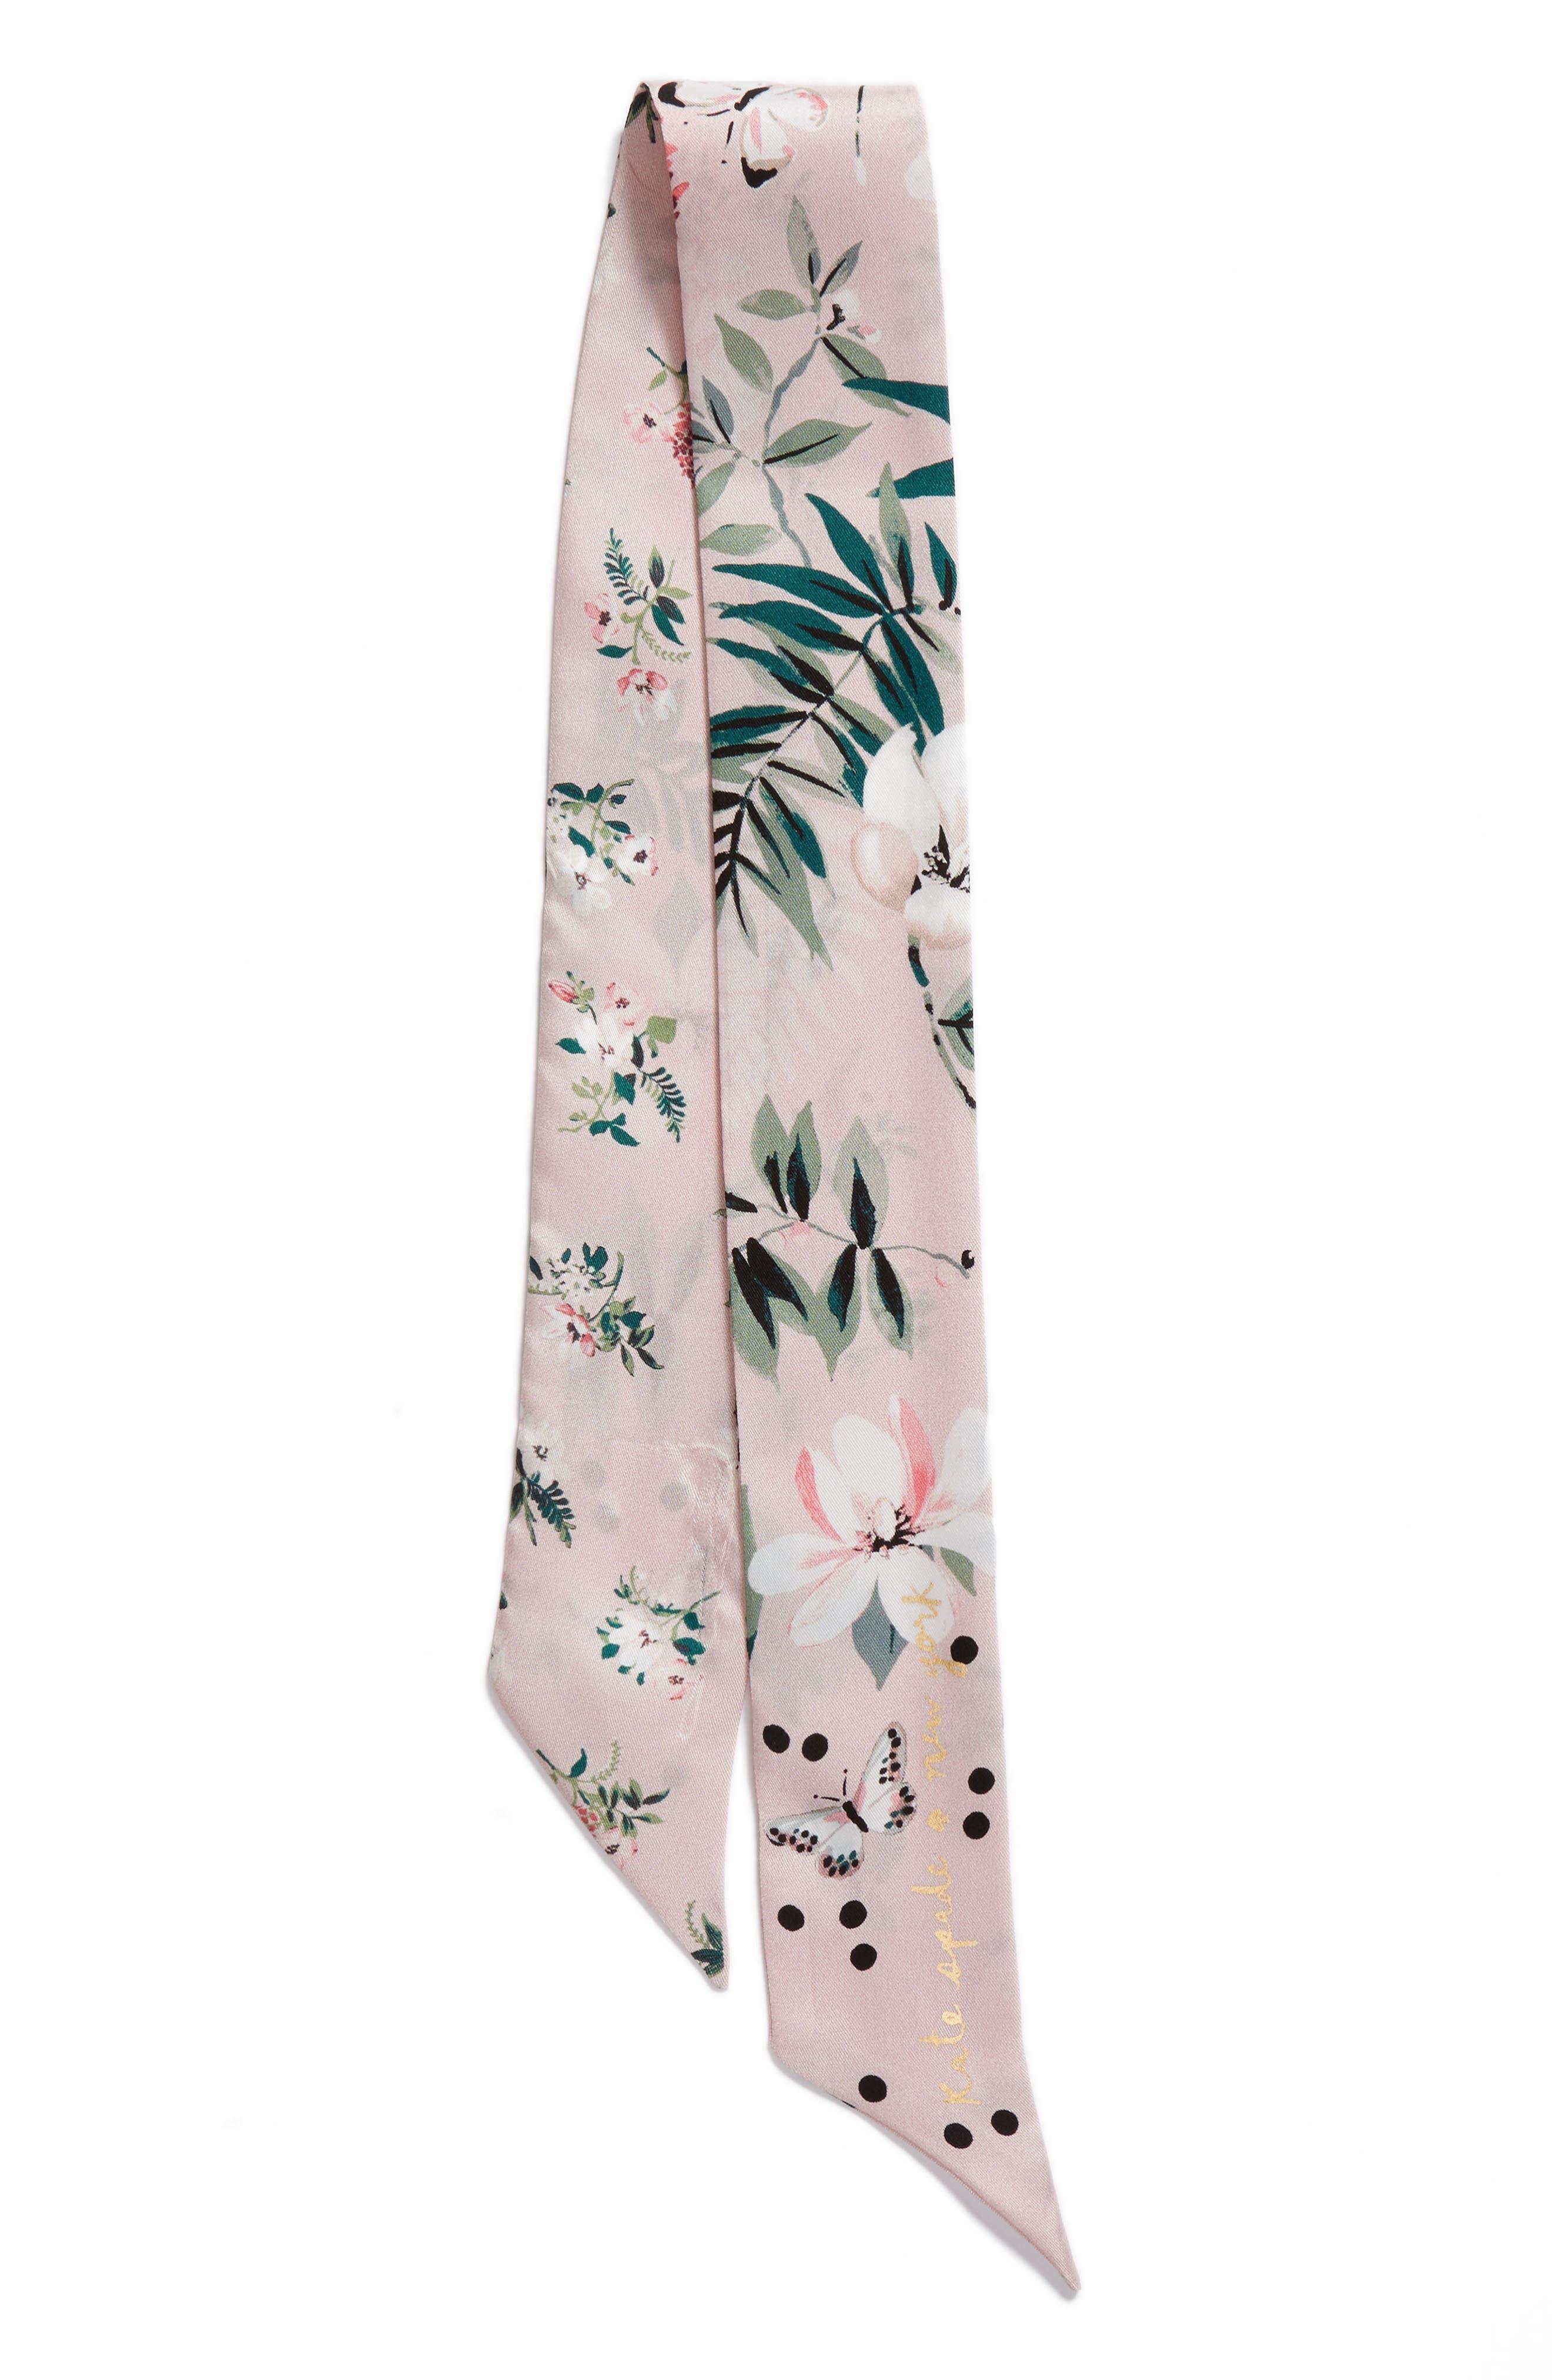 flora skinny silk scarf,                             Alternate thumbnail 2, color,                             Cameo Pink